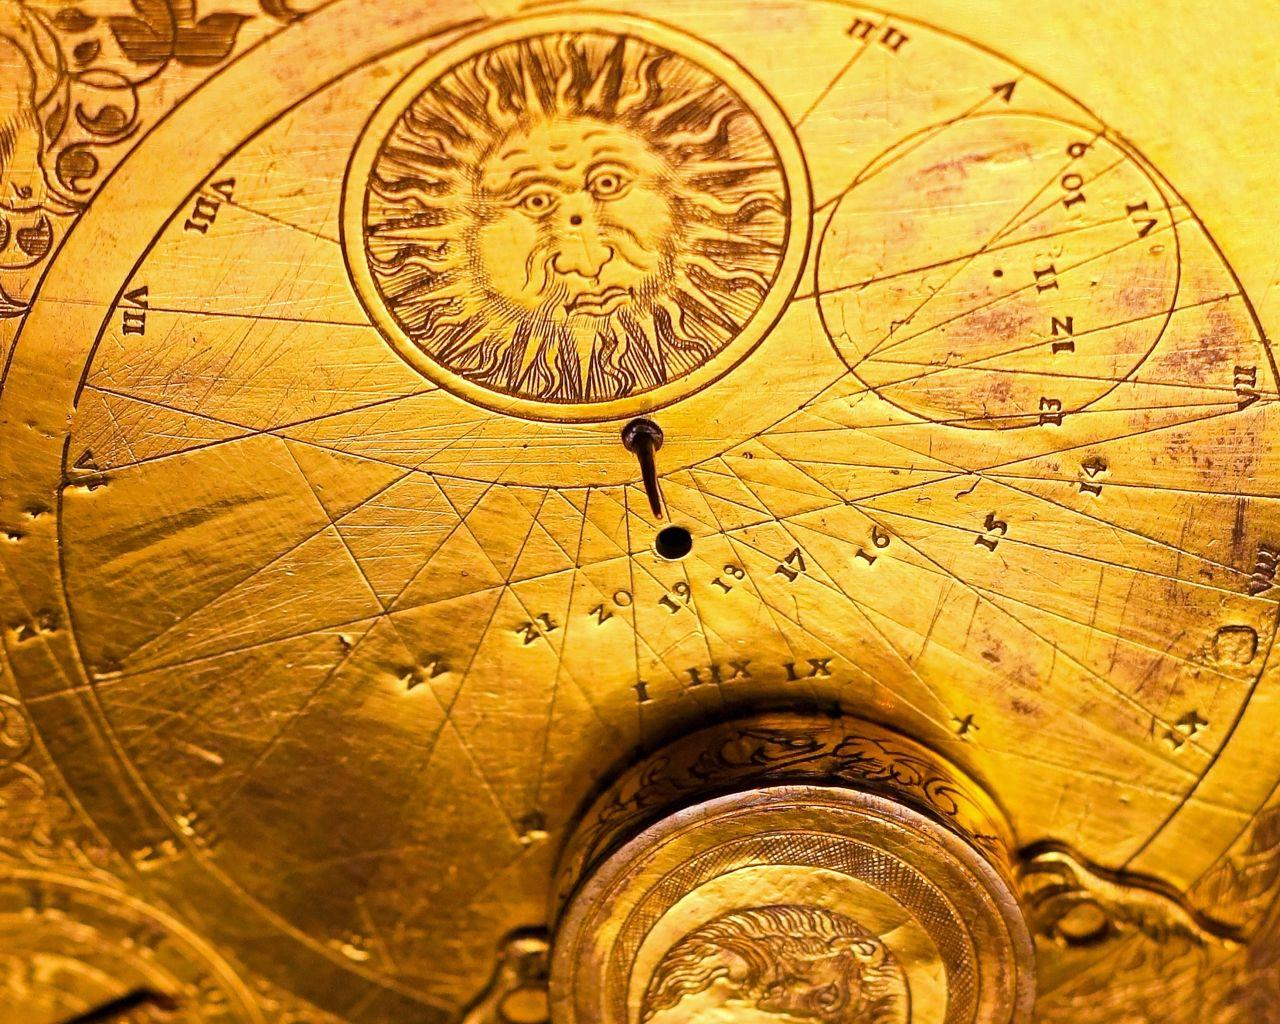 Astrology Symbol Key - Free Astrology Readings - Astrology